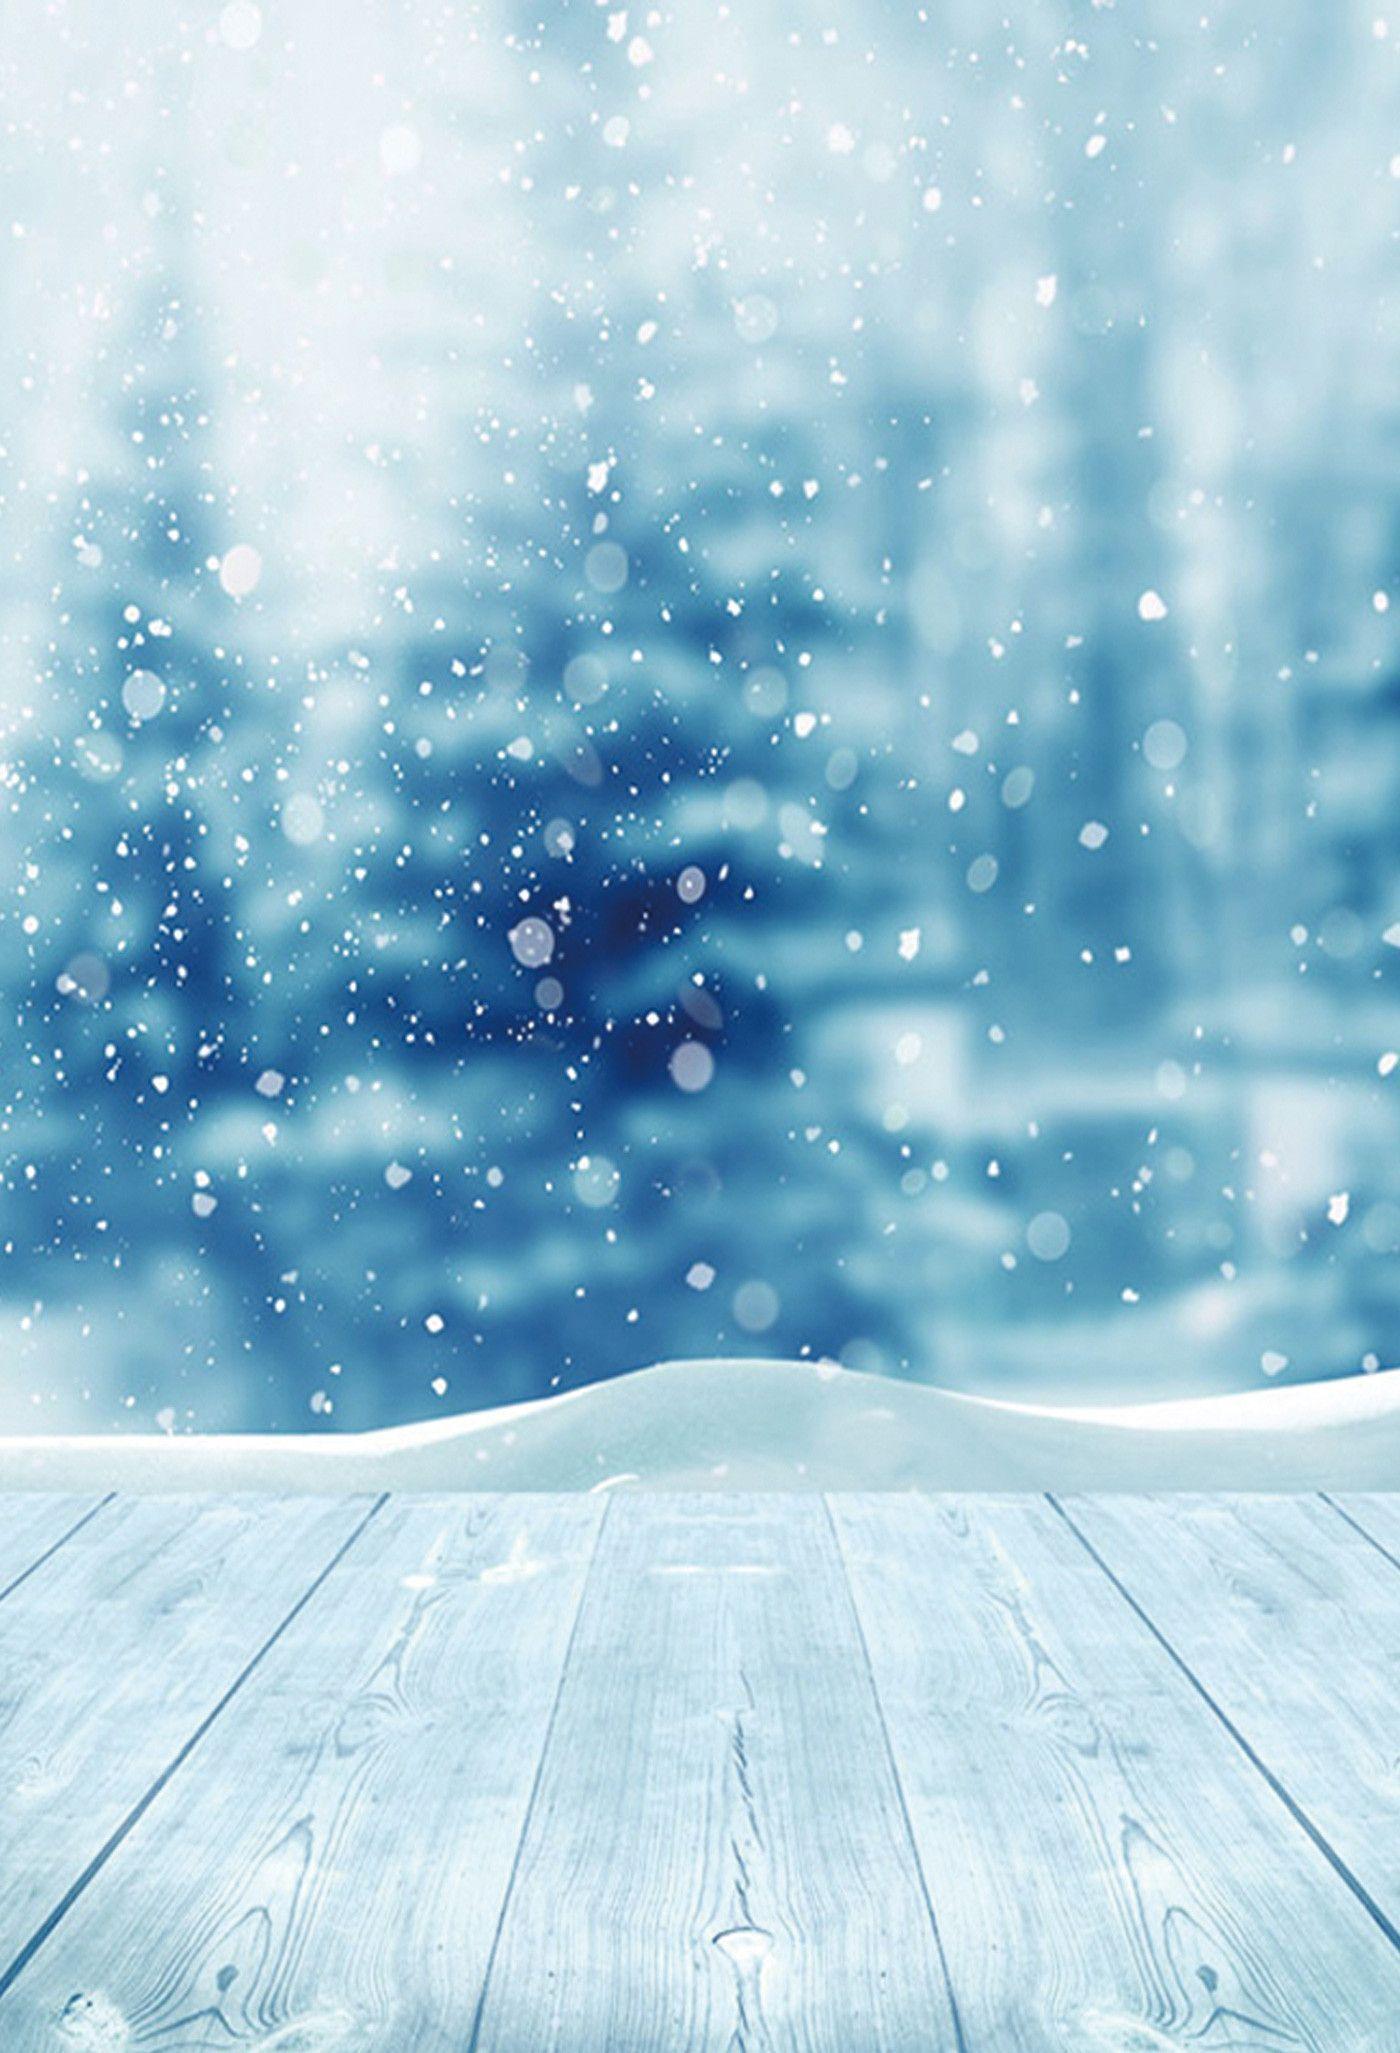 Season Backdrop Winter Background Snowflake Backdrop Blue Floor J02743 Glitterbackground Winter Background Winter Wallpaper Winter Backdrops